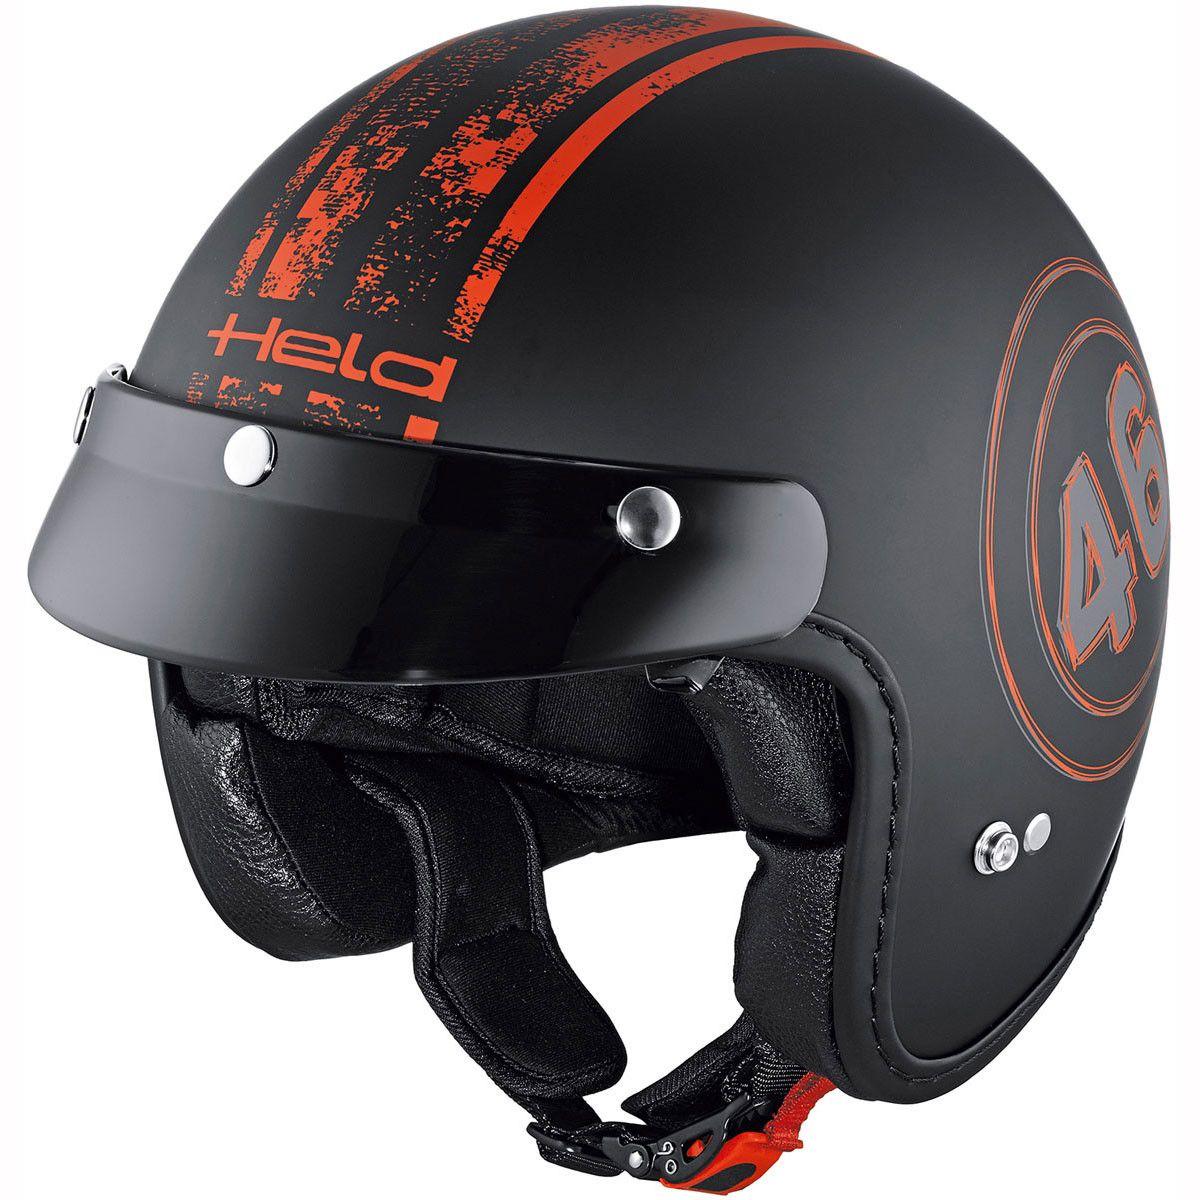 Held Helmet Black Bob 7540 Black Red Helmet, Black bob